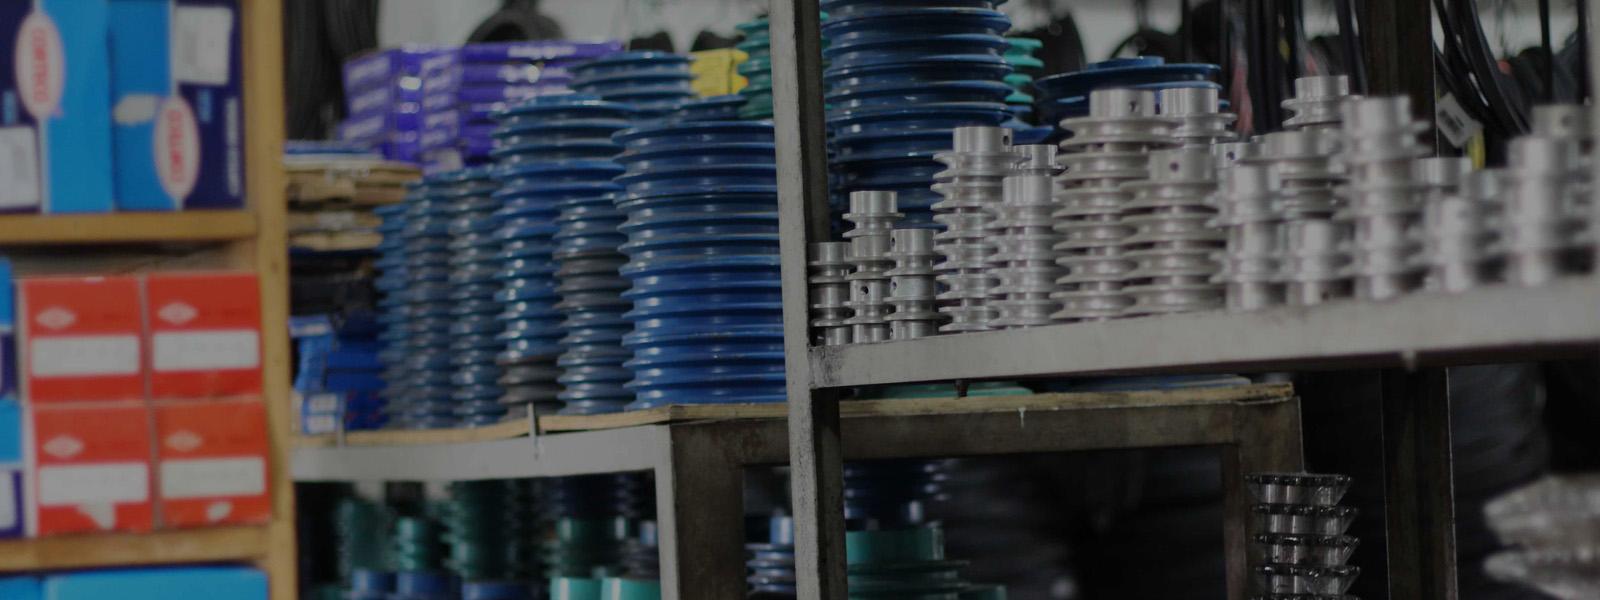 Variasi produk yang lengkap & spesifik pada komponen mesin industri adalah keunggulan kami